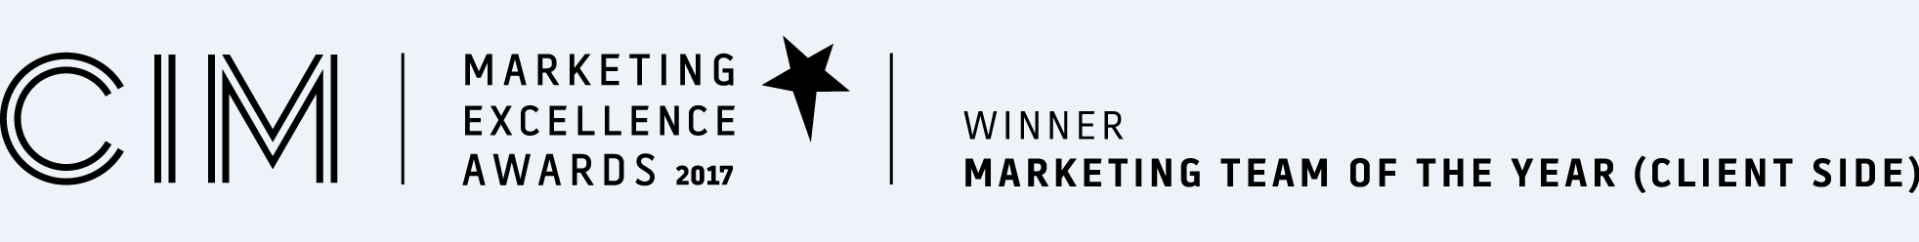 Marketing Excellence Award